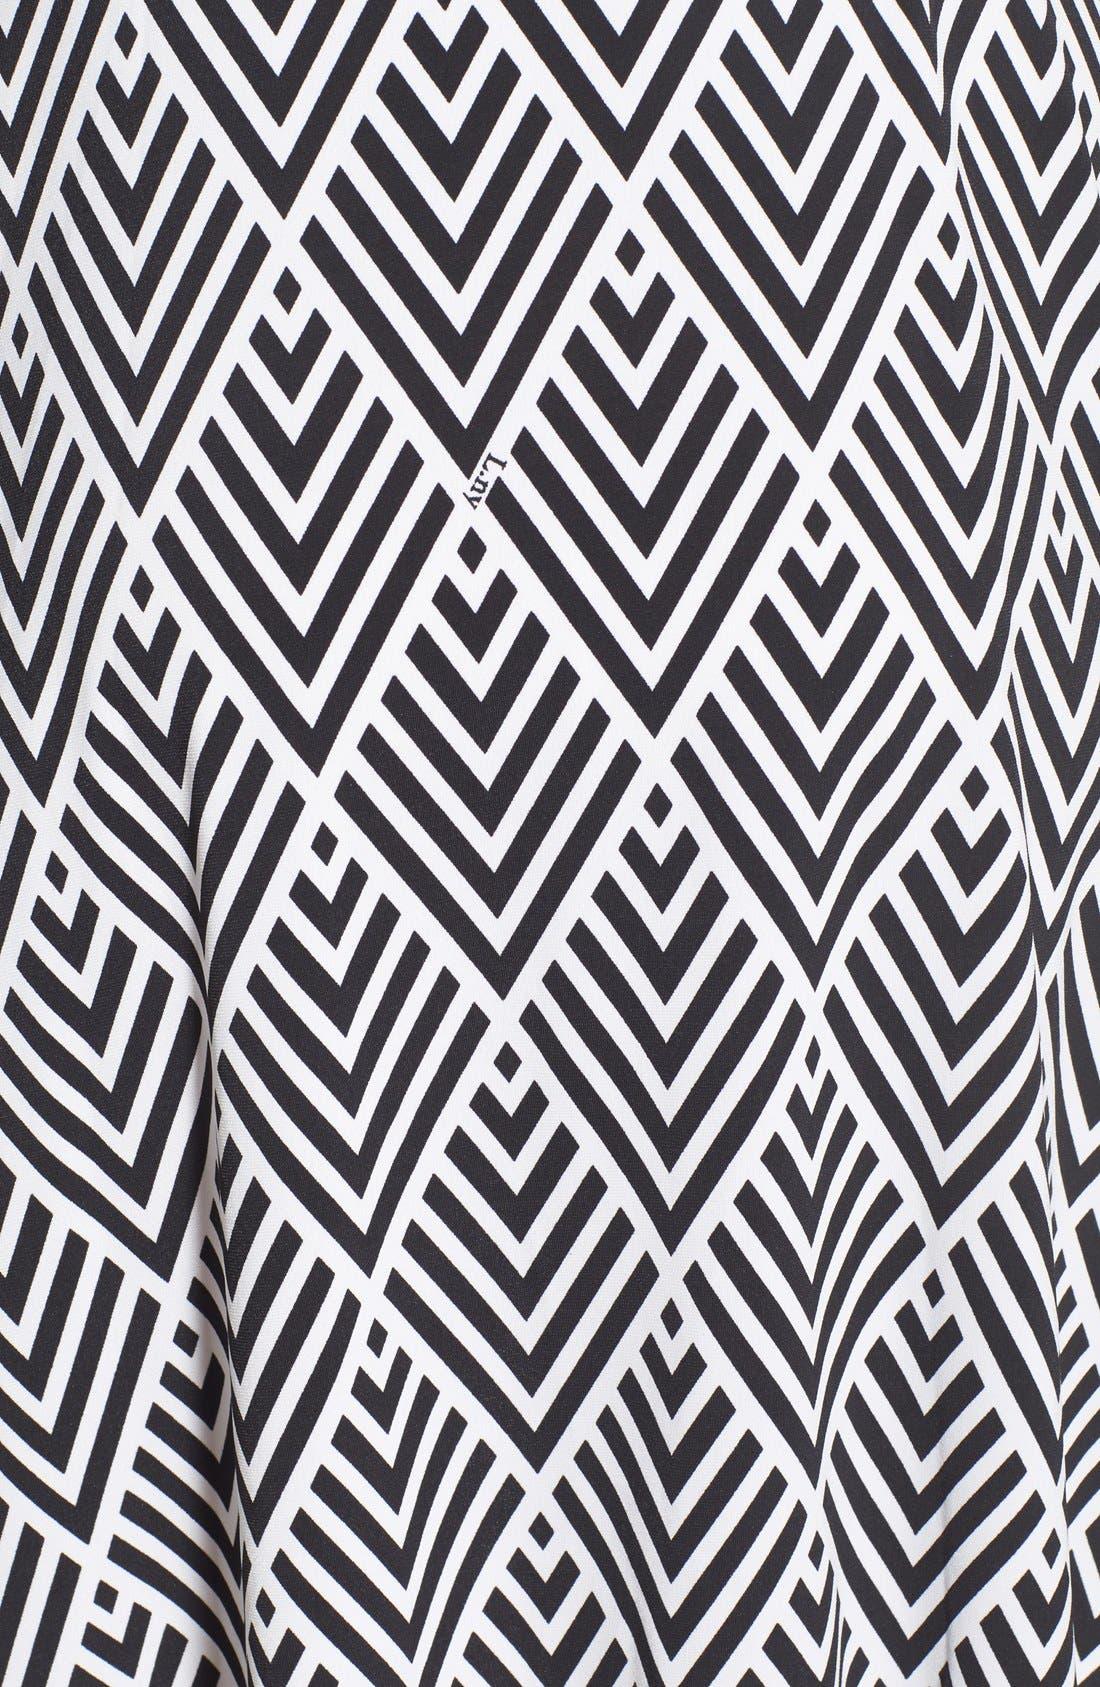 'Ilana' Belted Maternity Dress,                             Alternate thumbnail 3, color,                             001